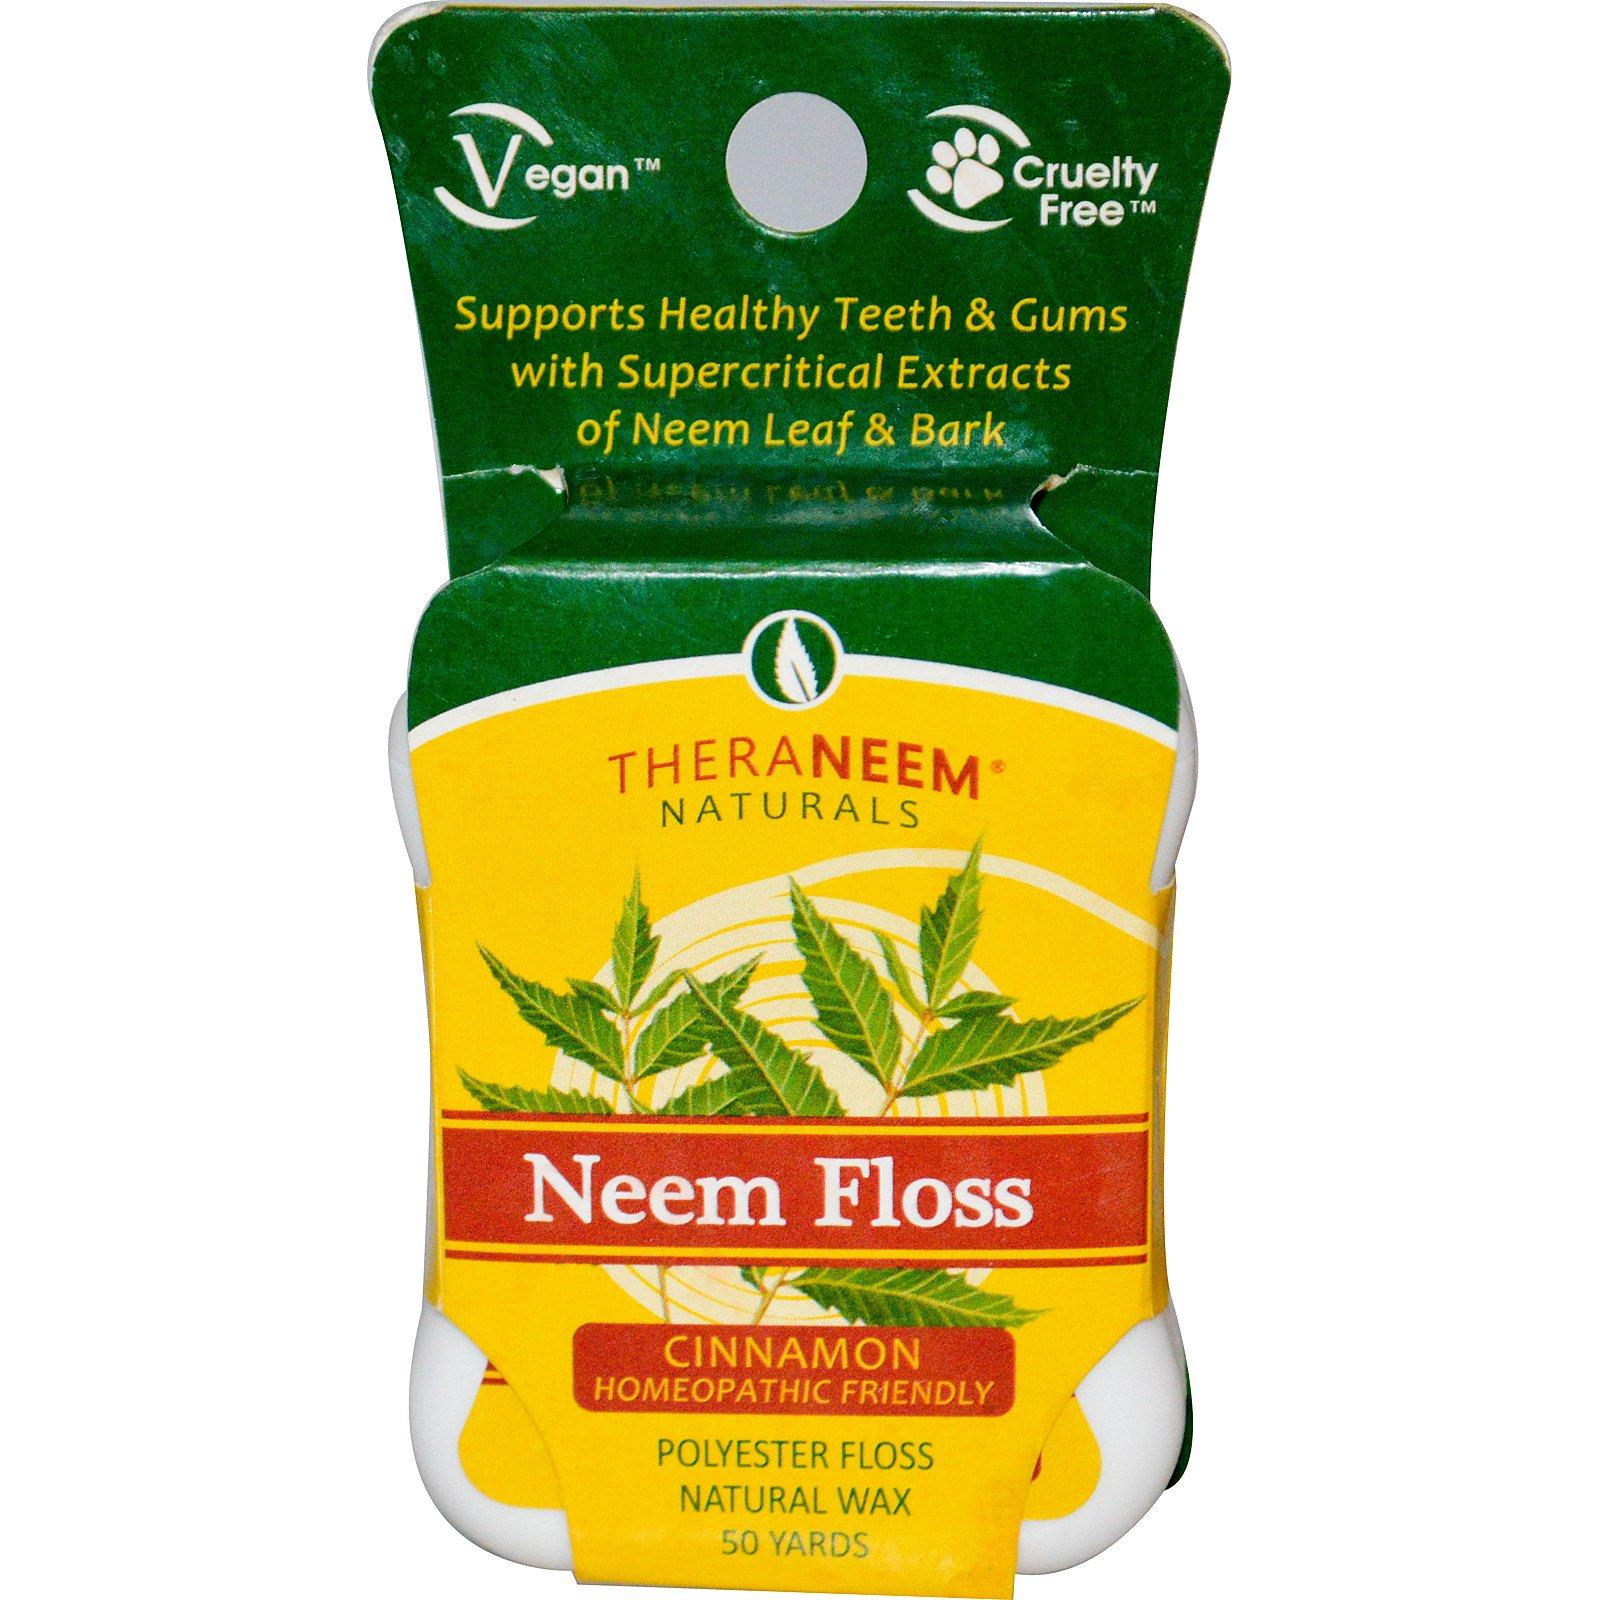 Organix South, TheraNeem Naturals, Neem Floss, Cinnamon, 50 Yards